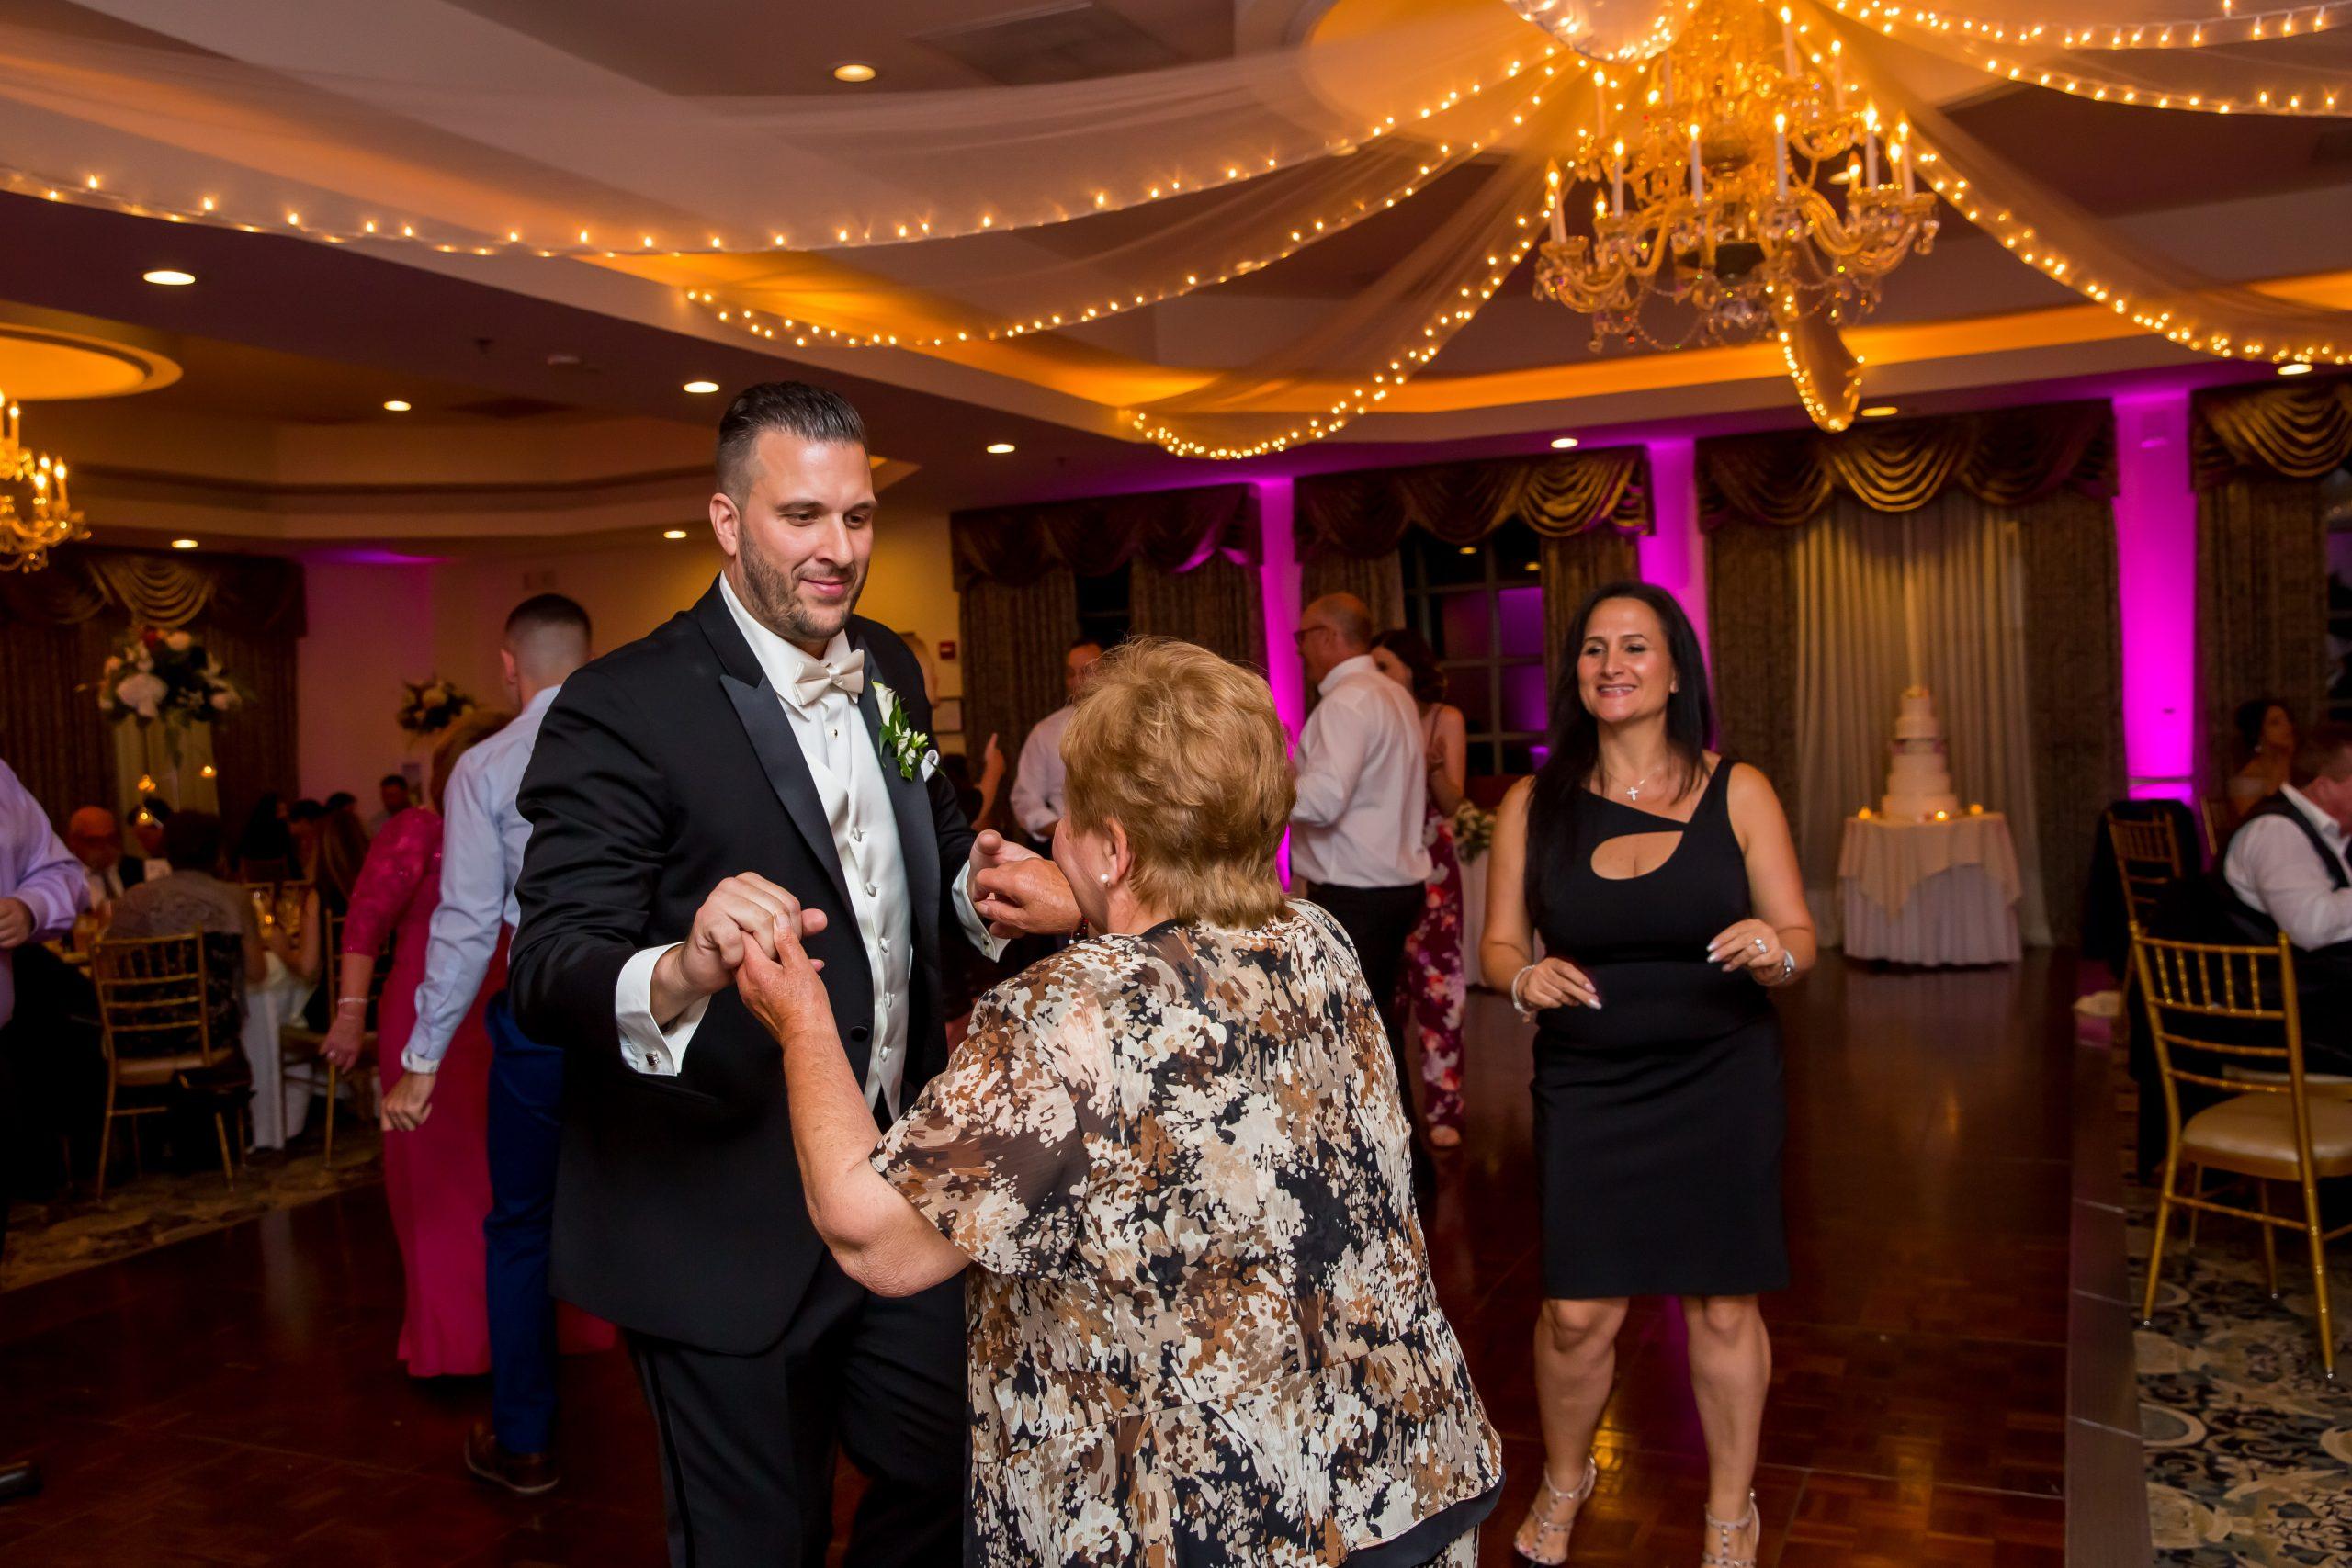 Victori_Rob_Mohawk River Country Club Wedding-59.jpg